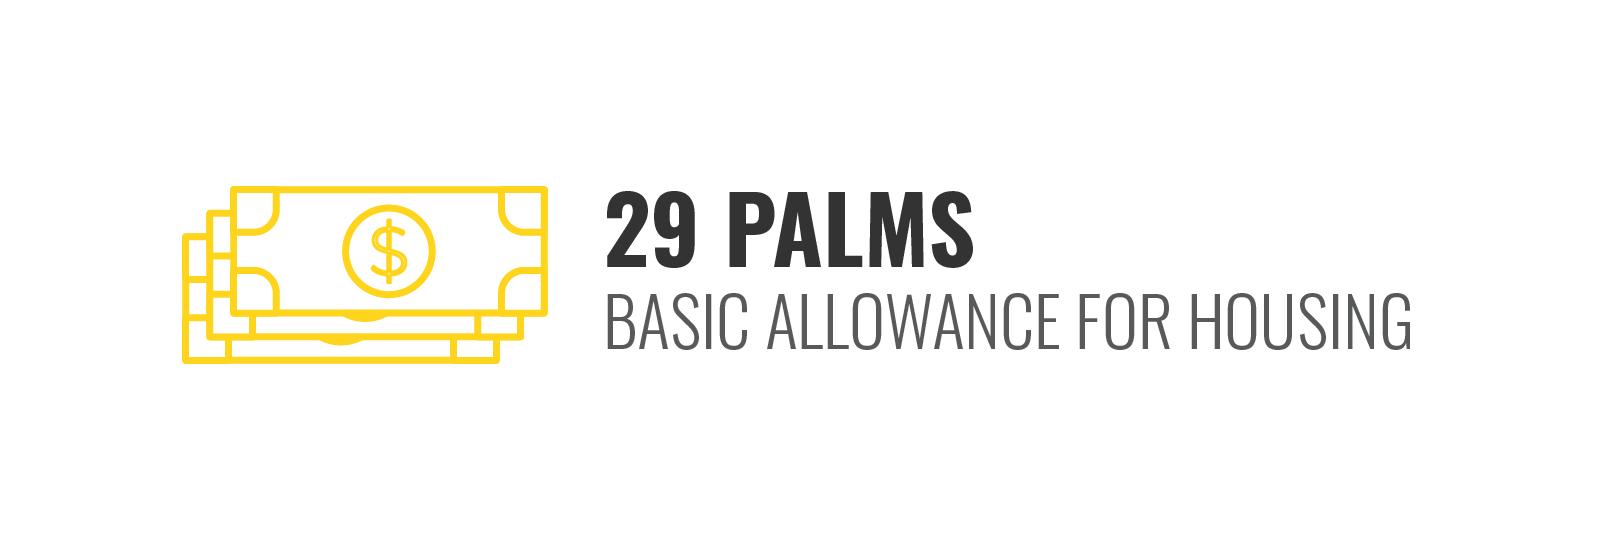 29 Palms BAH